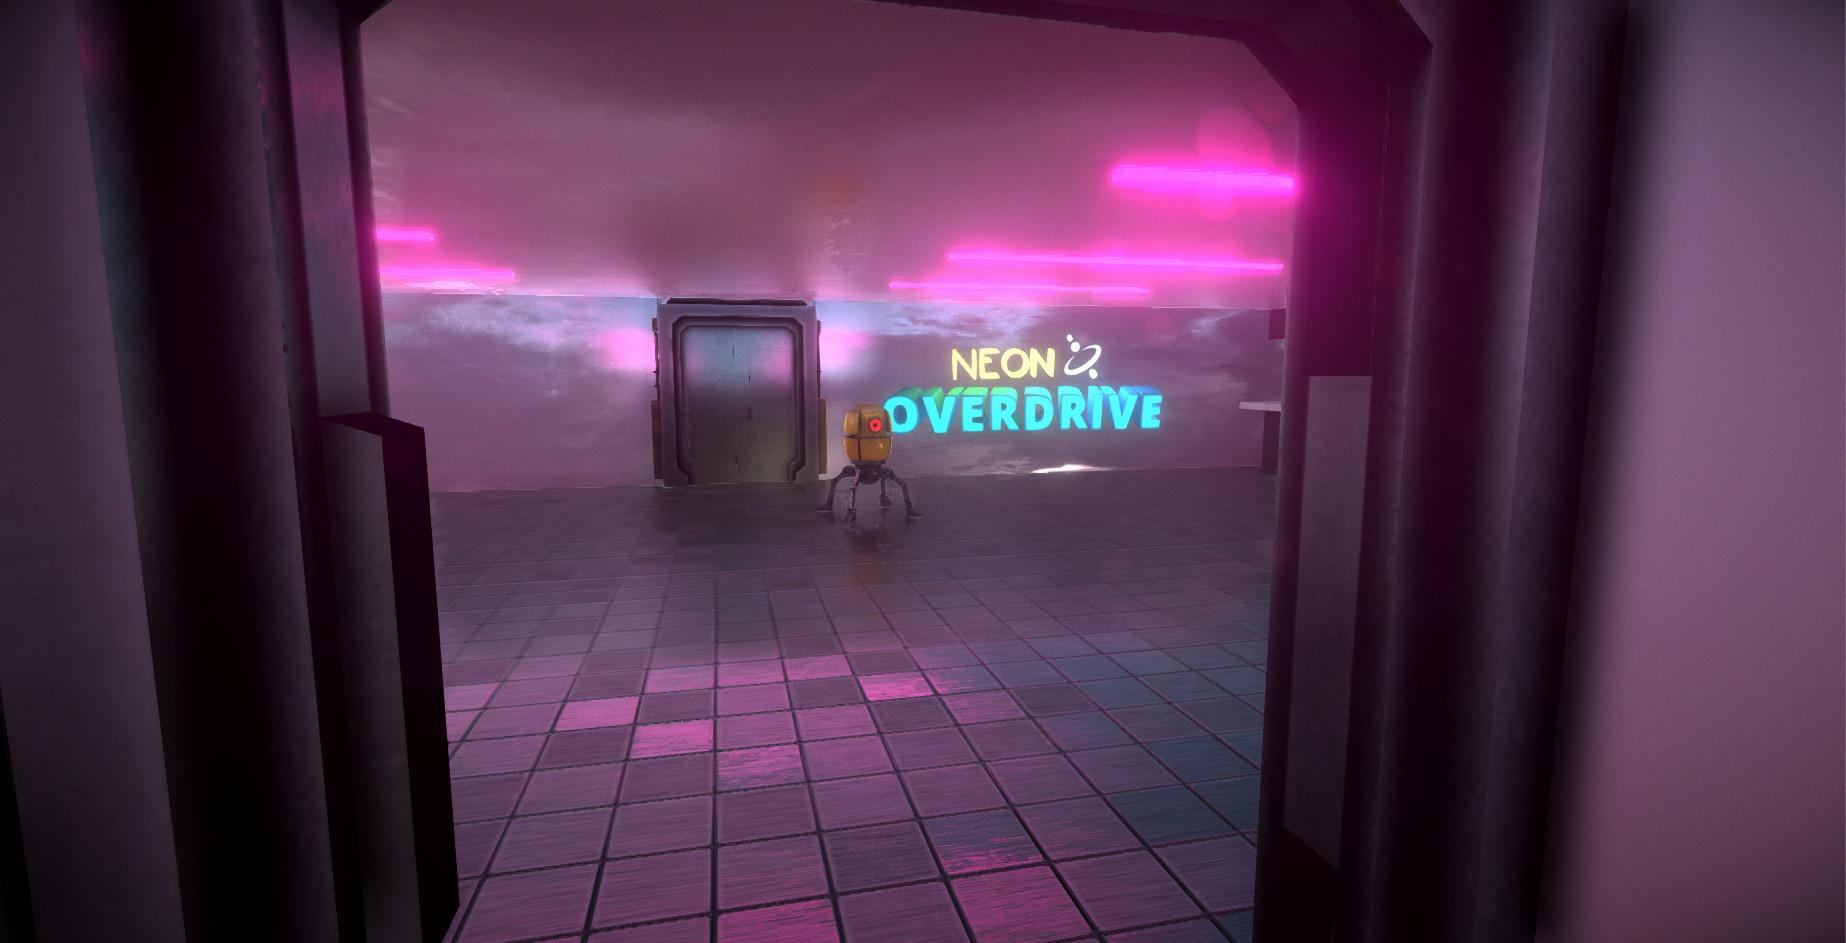 Neon Overdrive